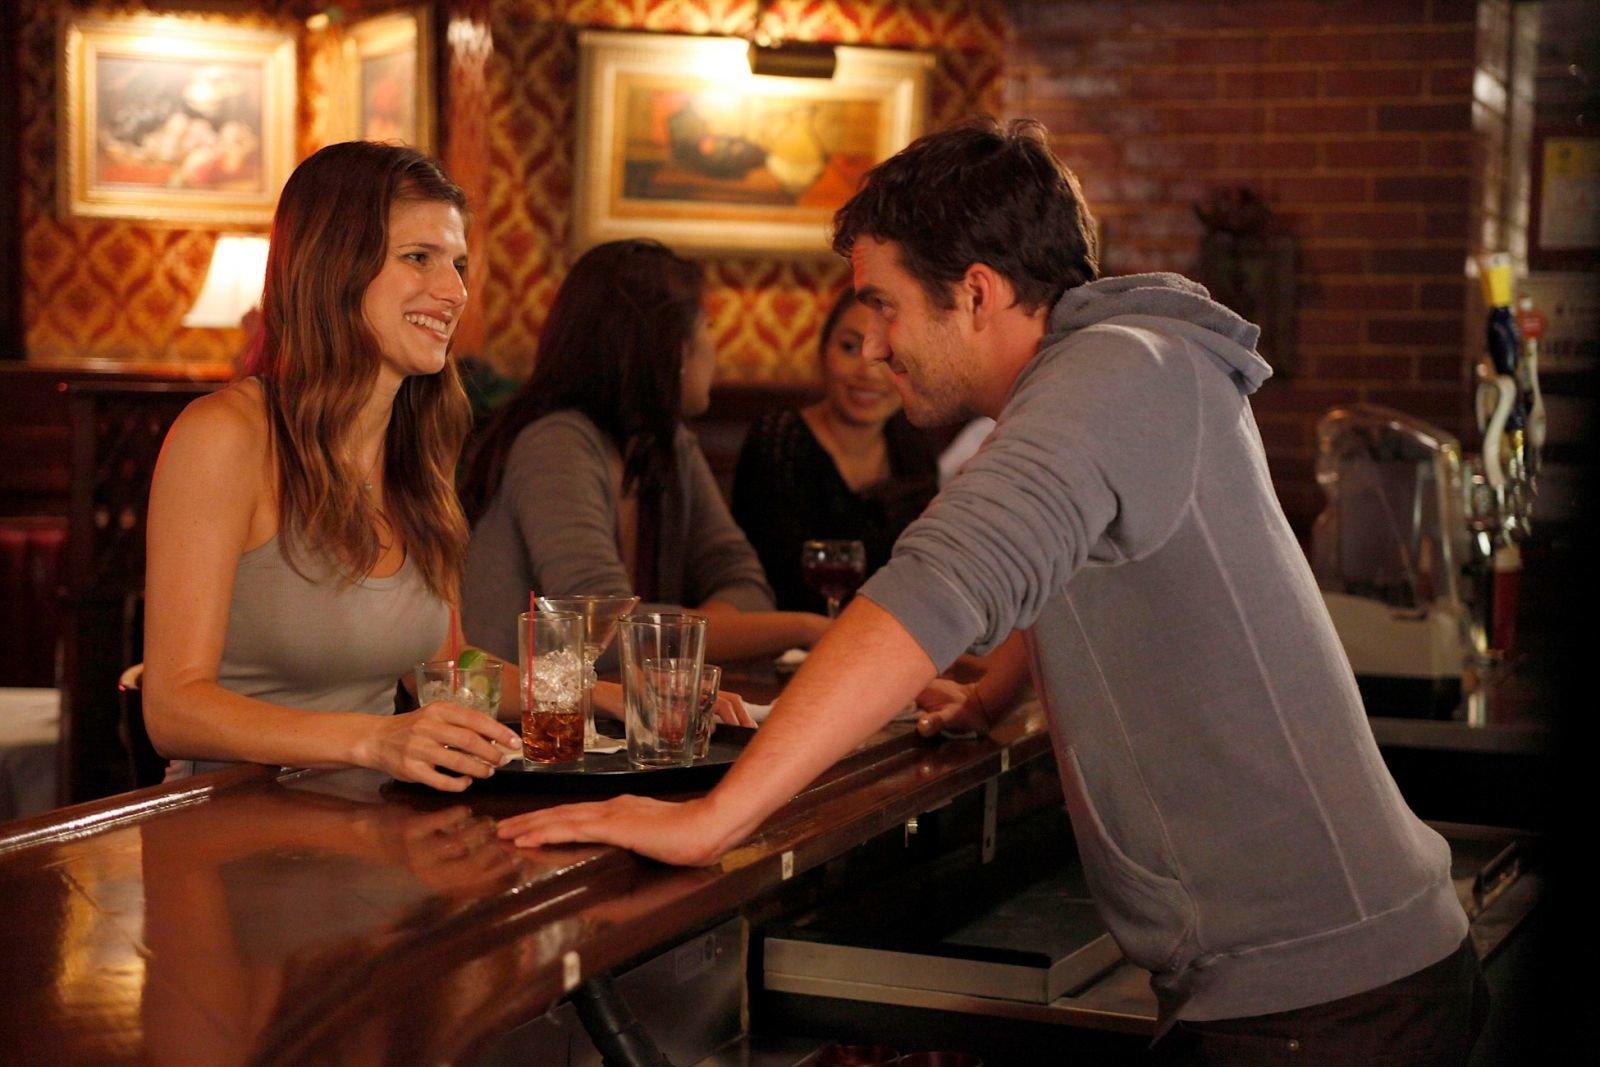 'New Girl' Season 1, Episode 4 Recap - 'Naked'